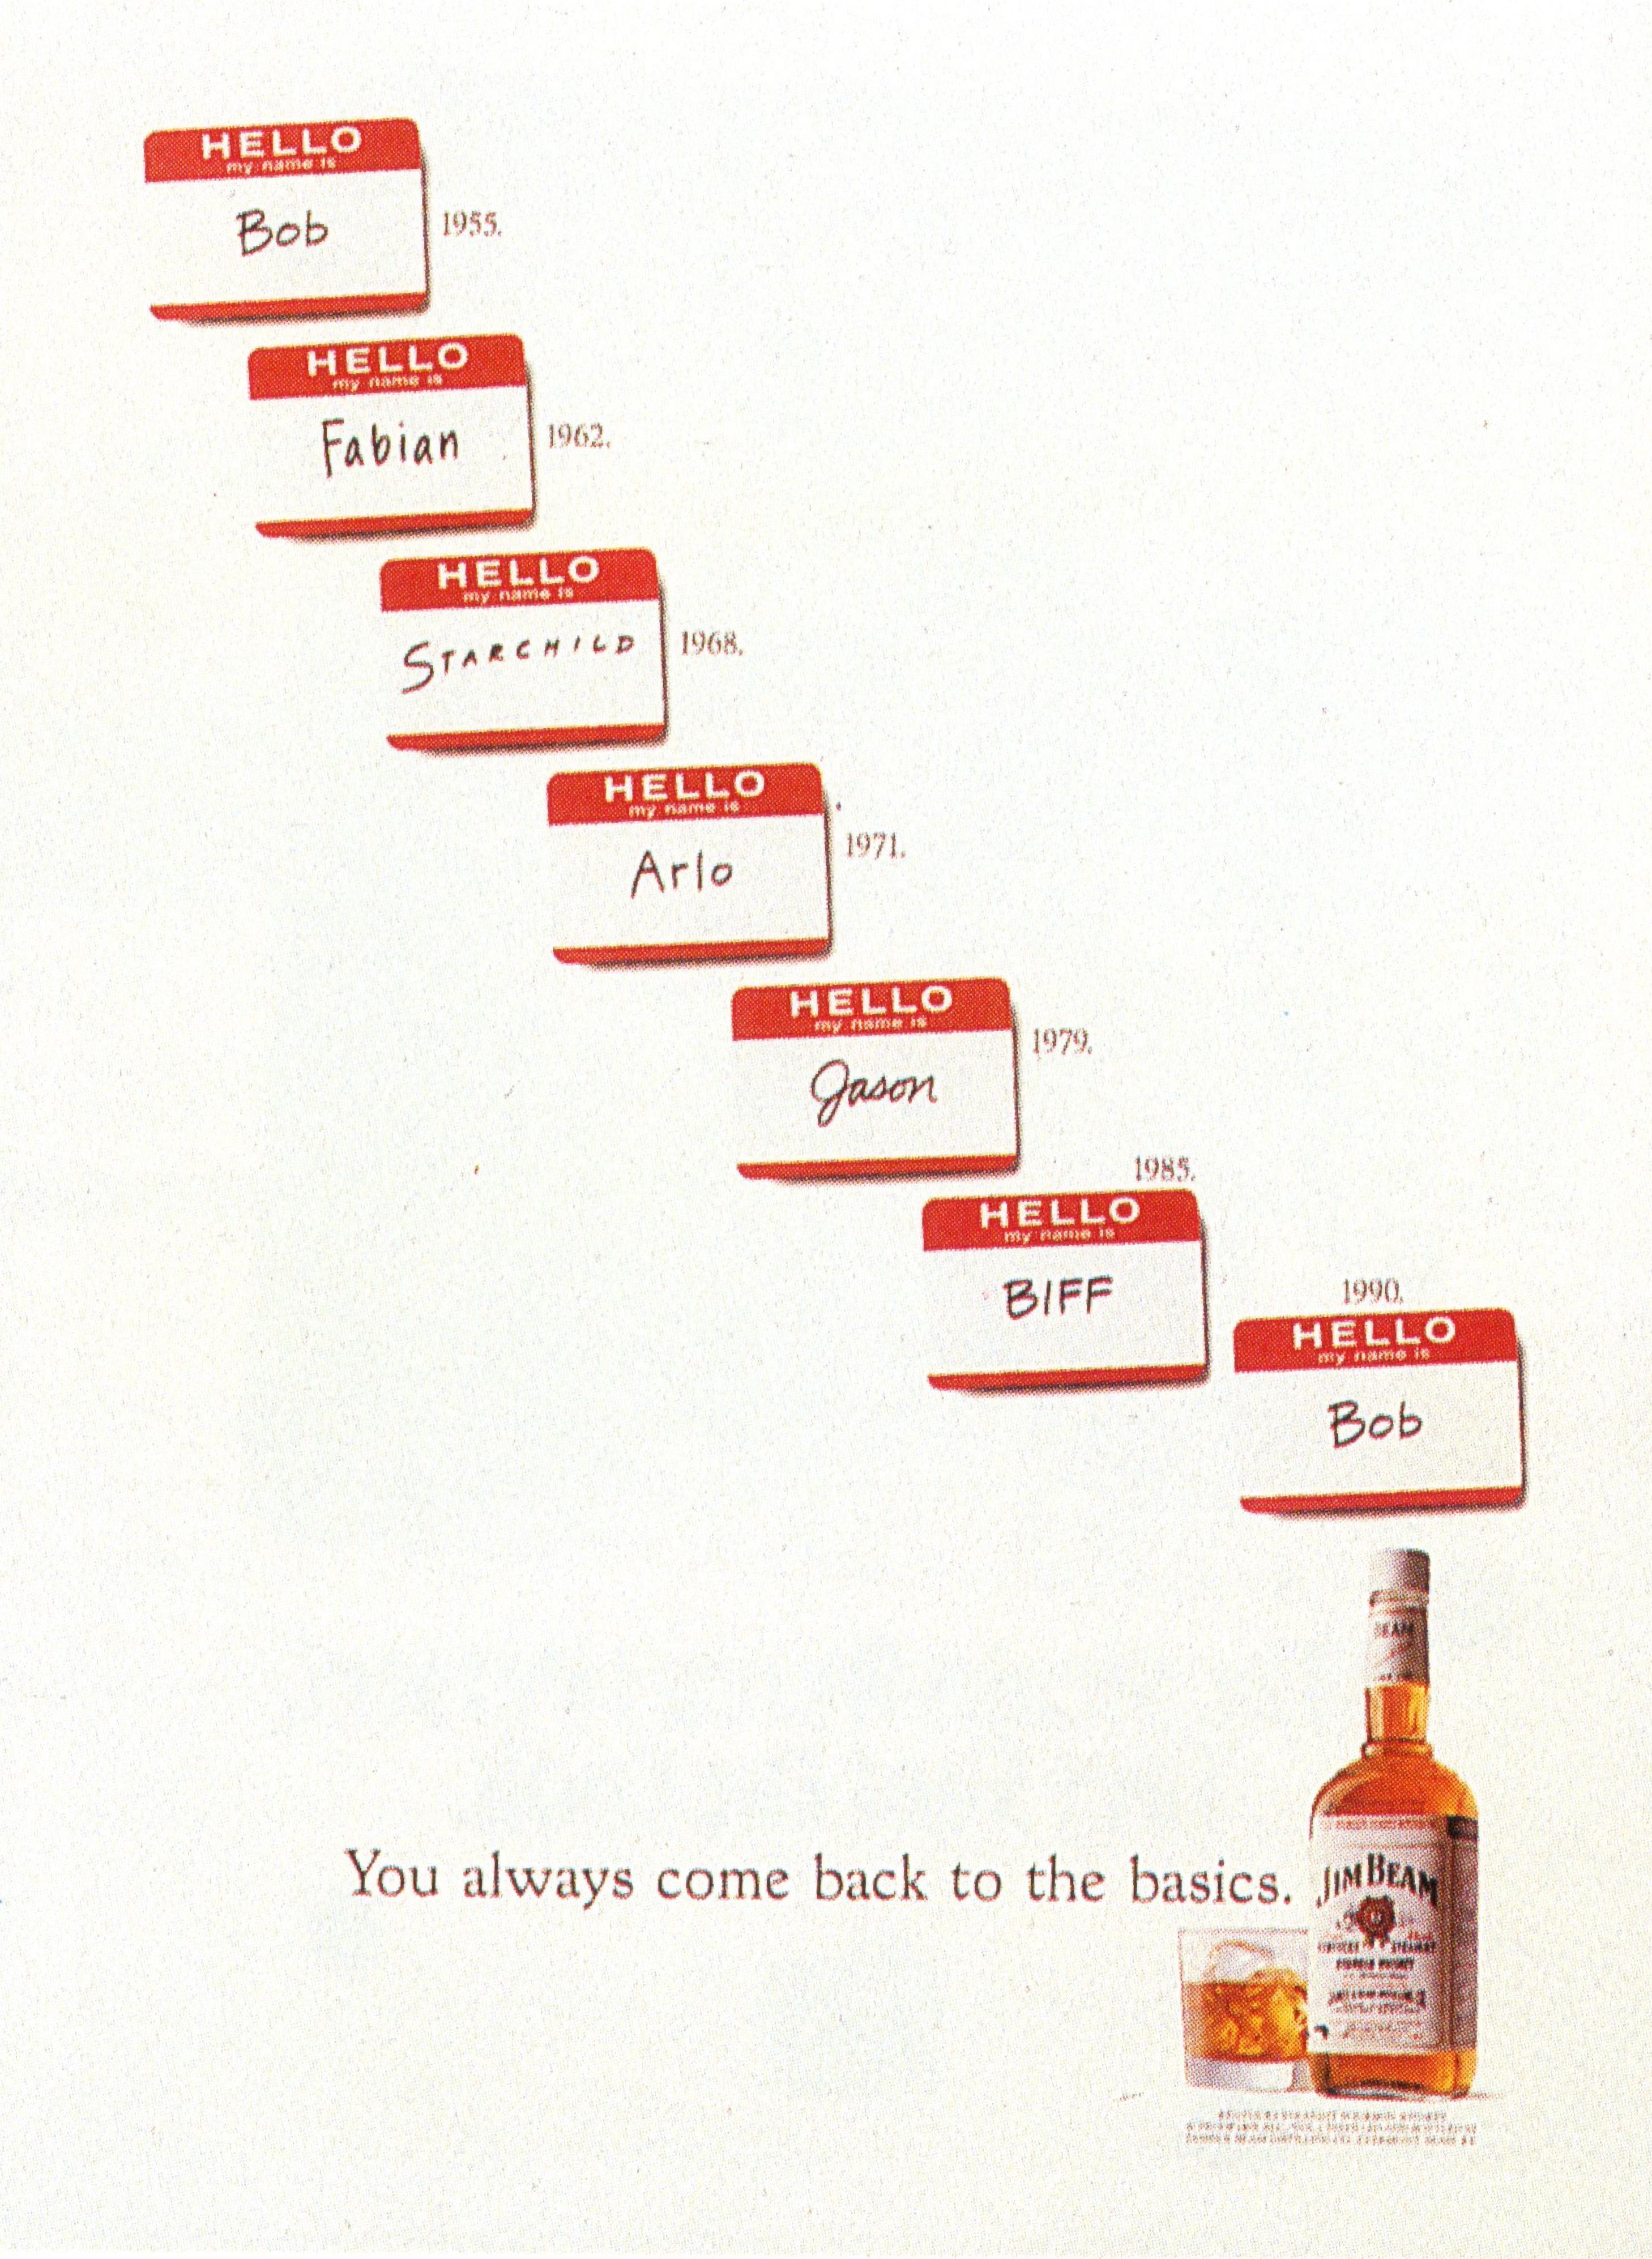 'Name Badges' Jim Beam, Fallon McElligott-01.jpg